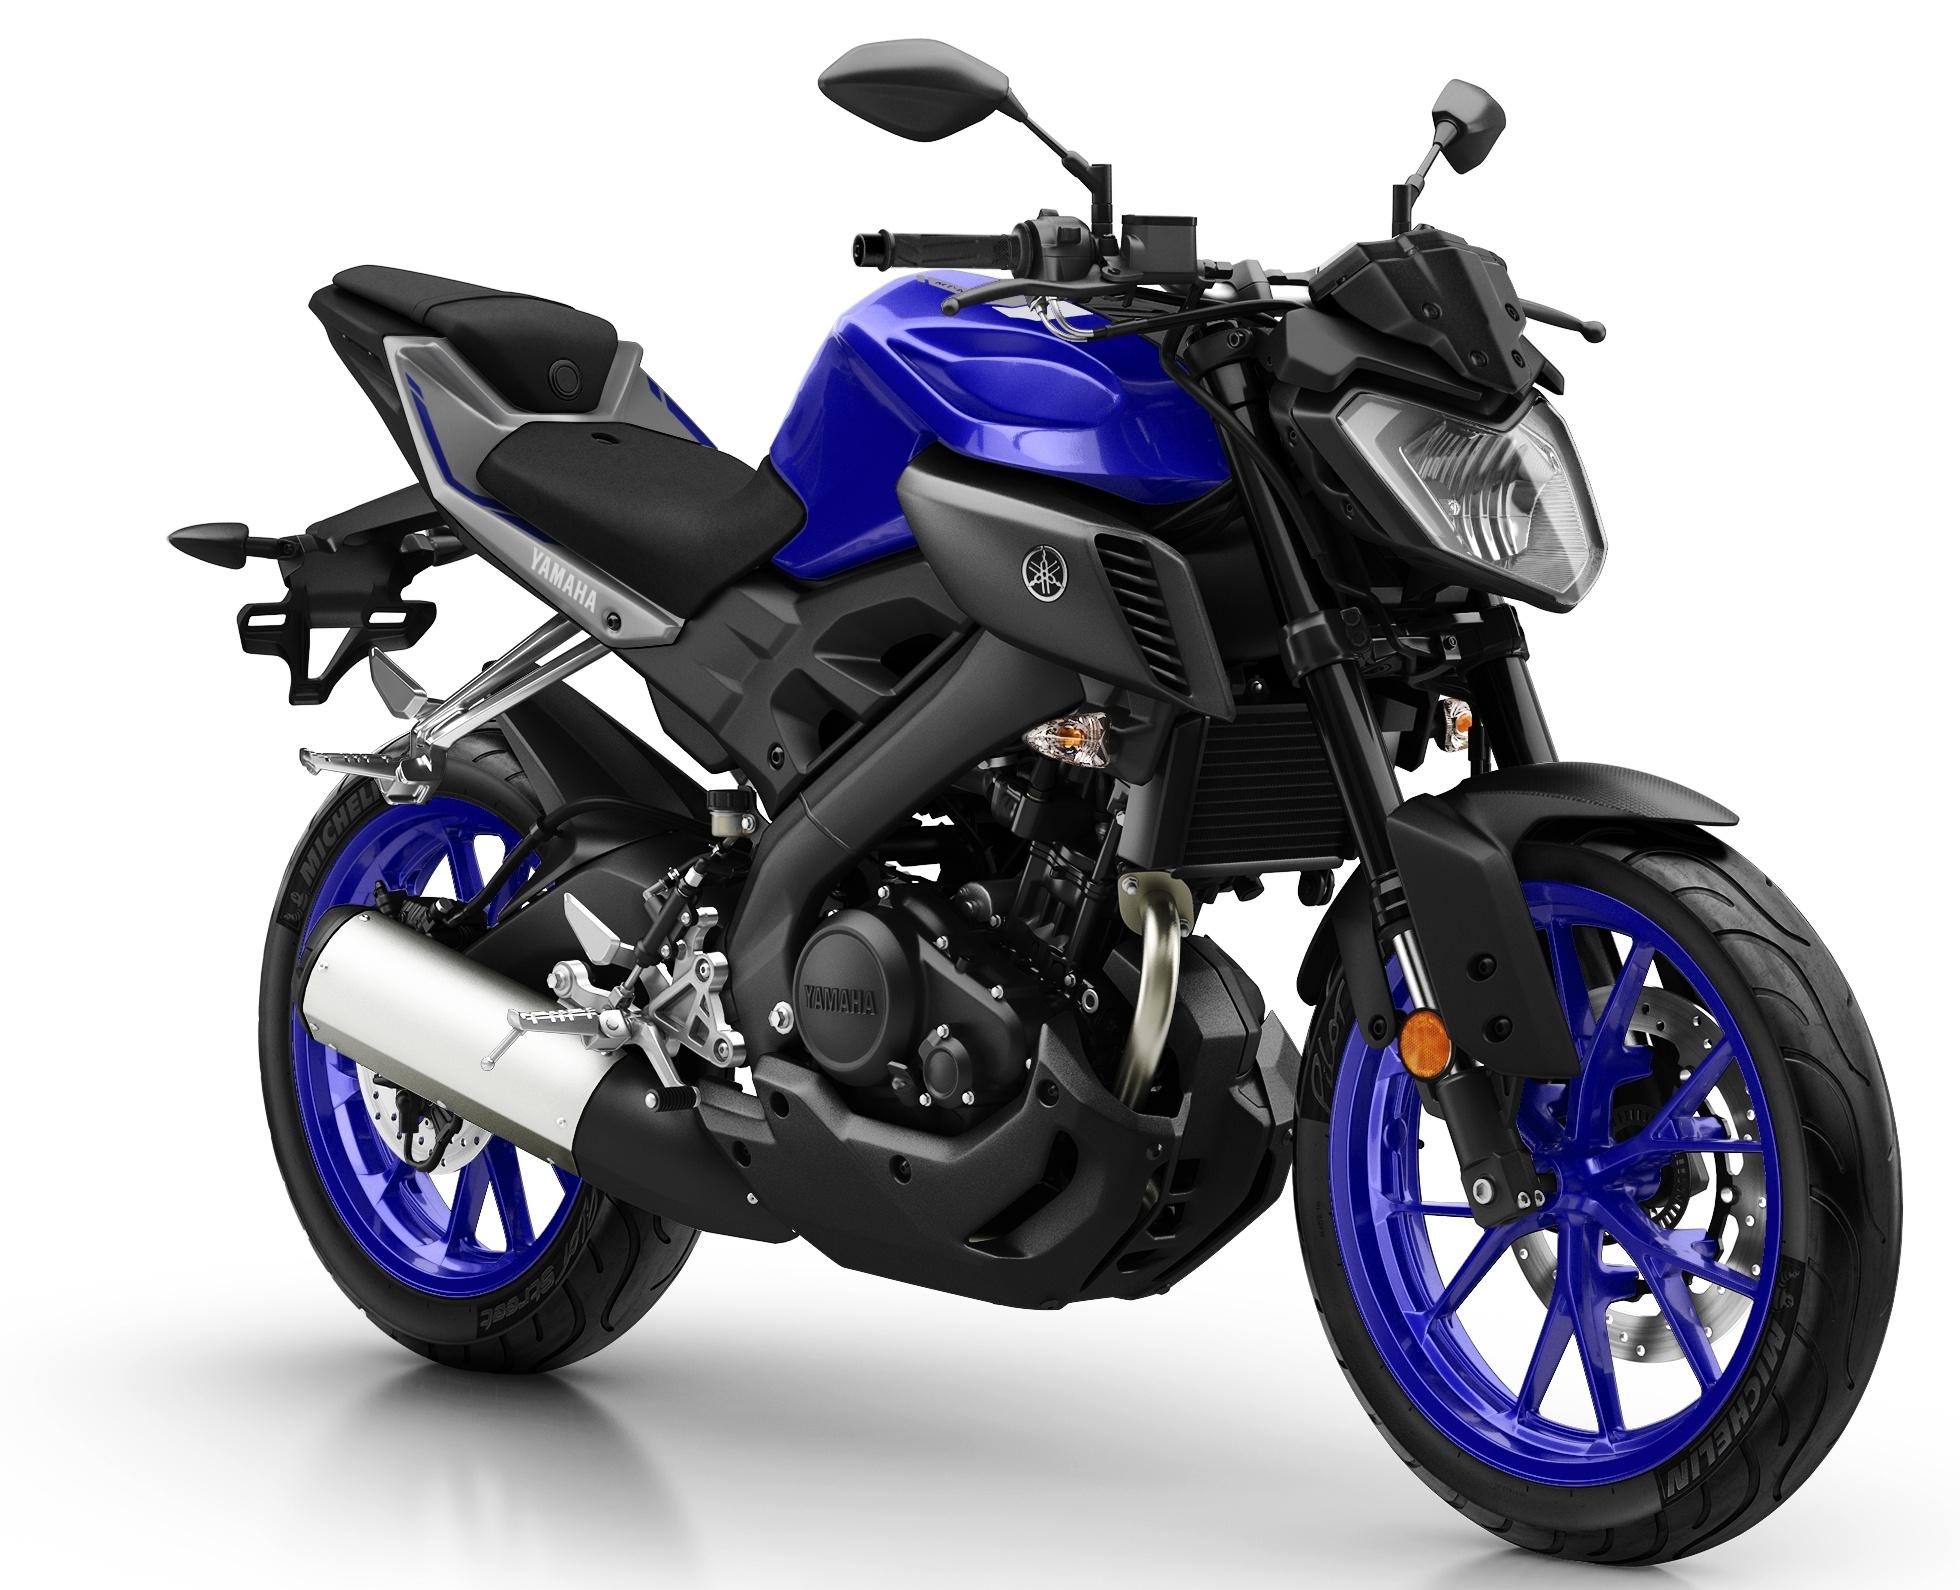 2017 yamaha motorcycles get new colour schemes image 556334. Black Bedroom Furniture Sets. Home Design Ideas